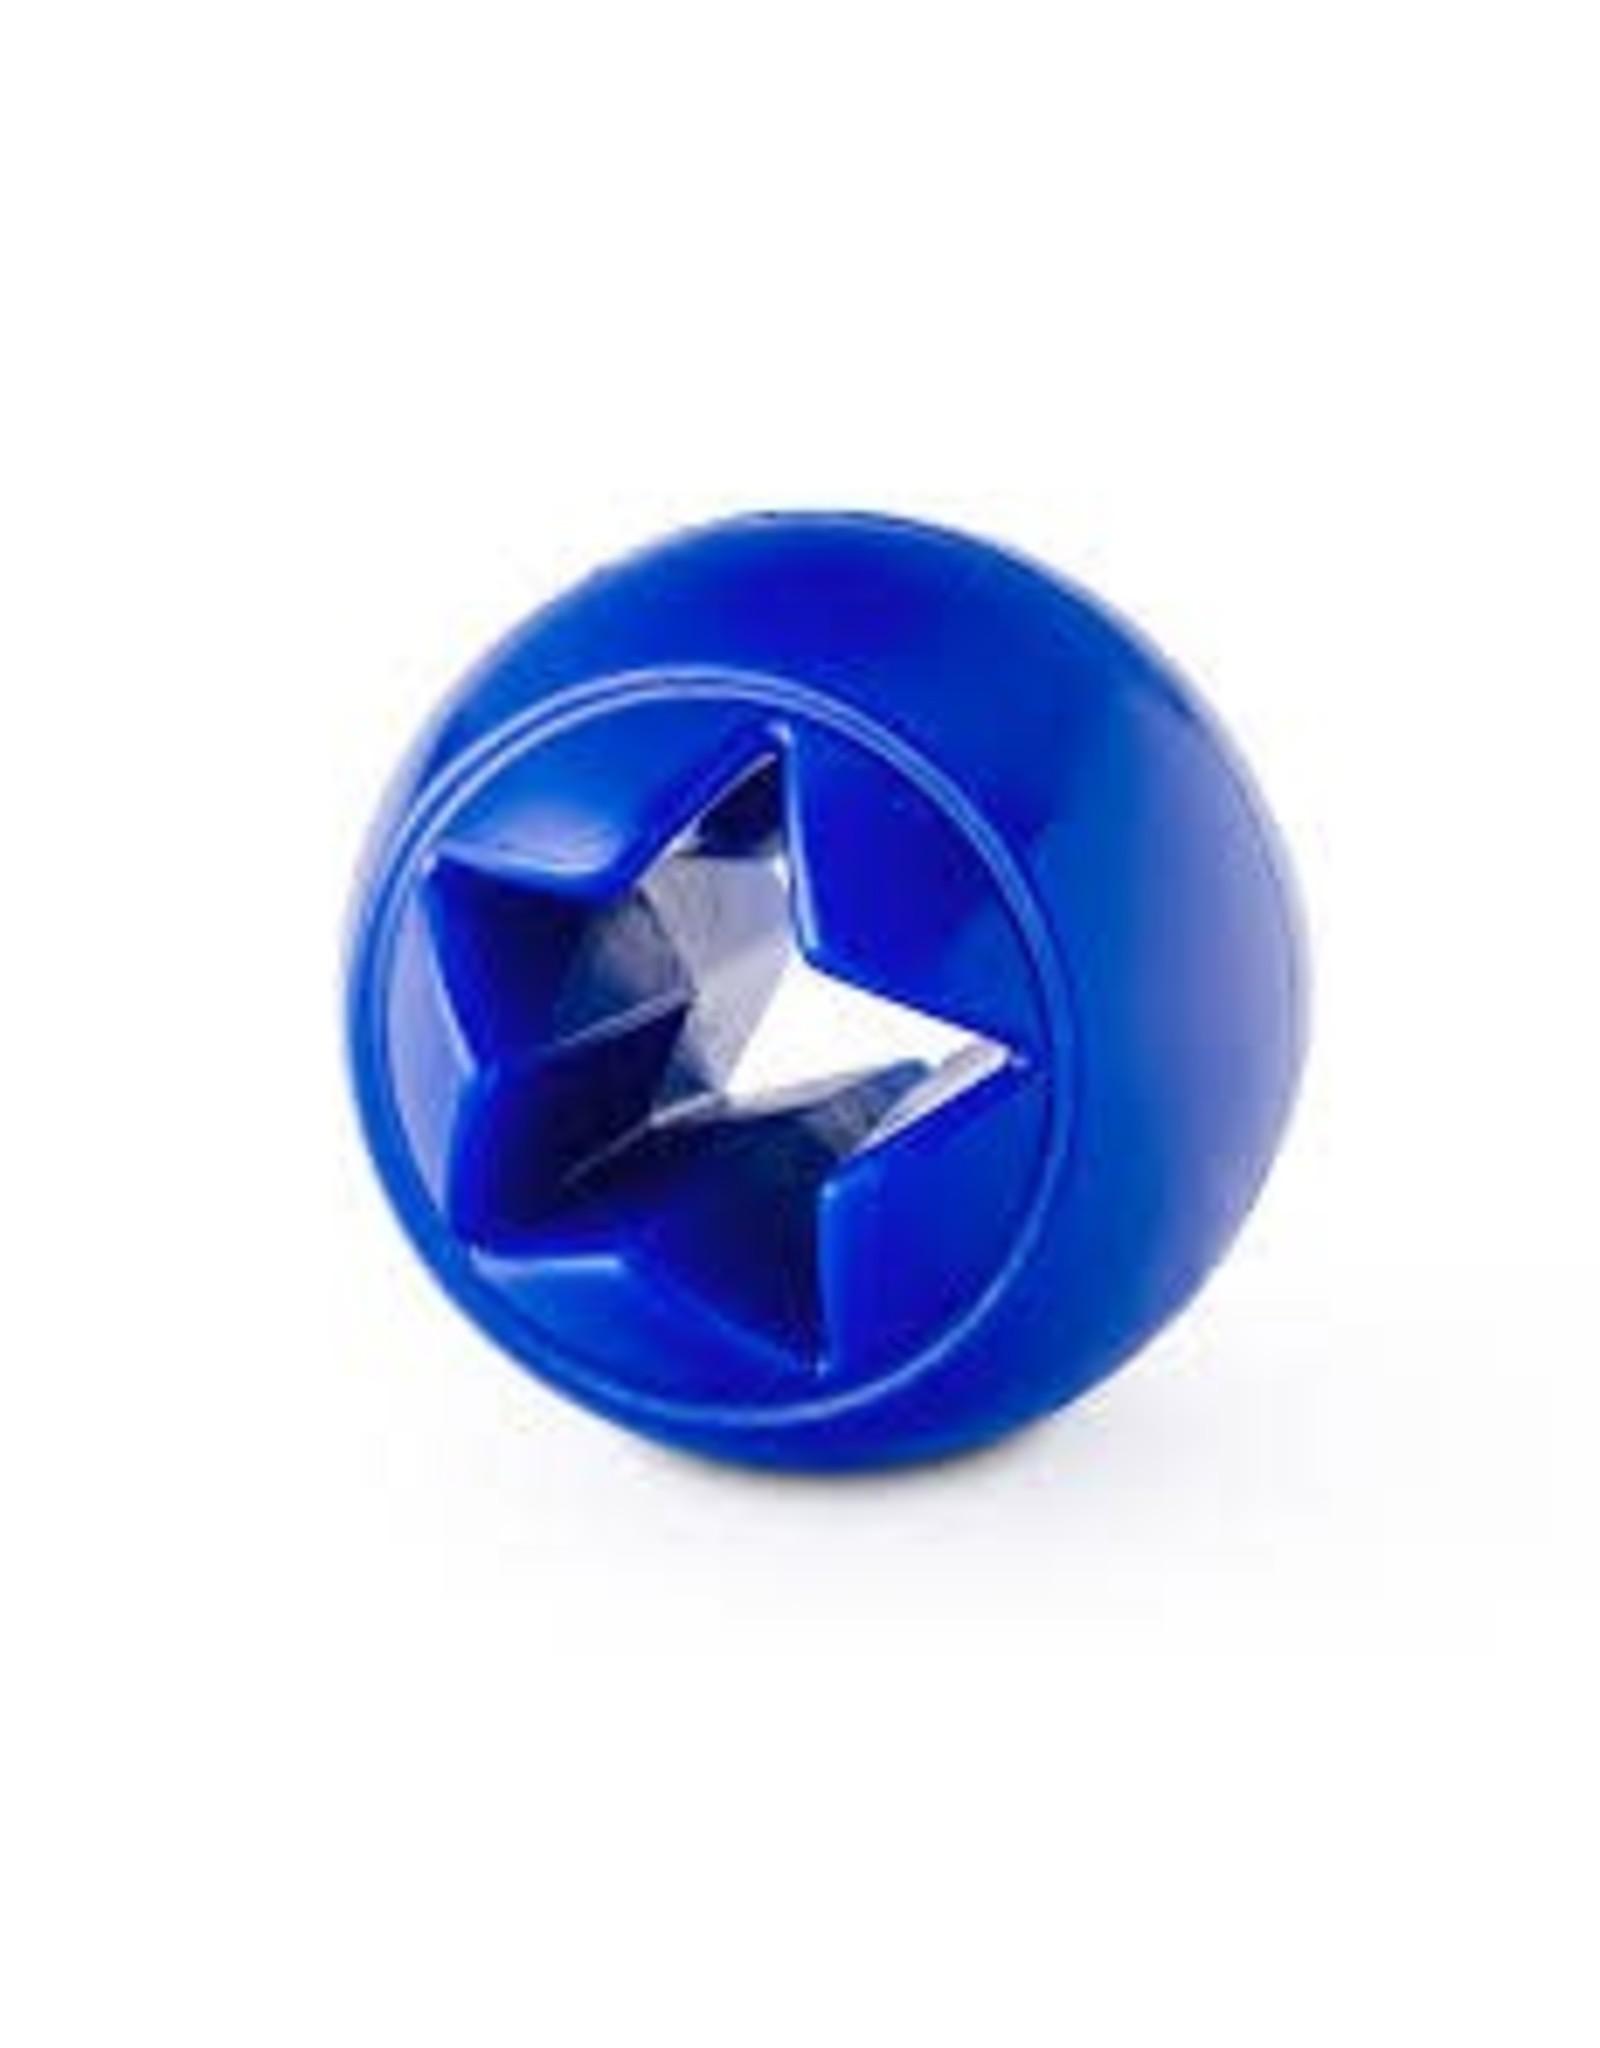 PLANET DOG PLANET DOG NOOK BALL BLUE STAR